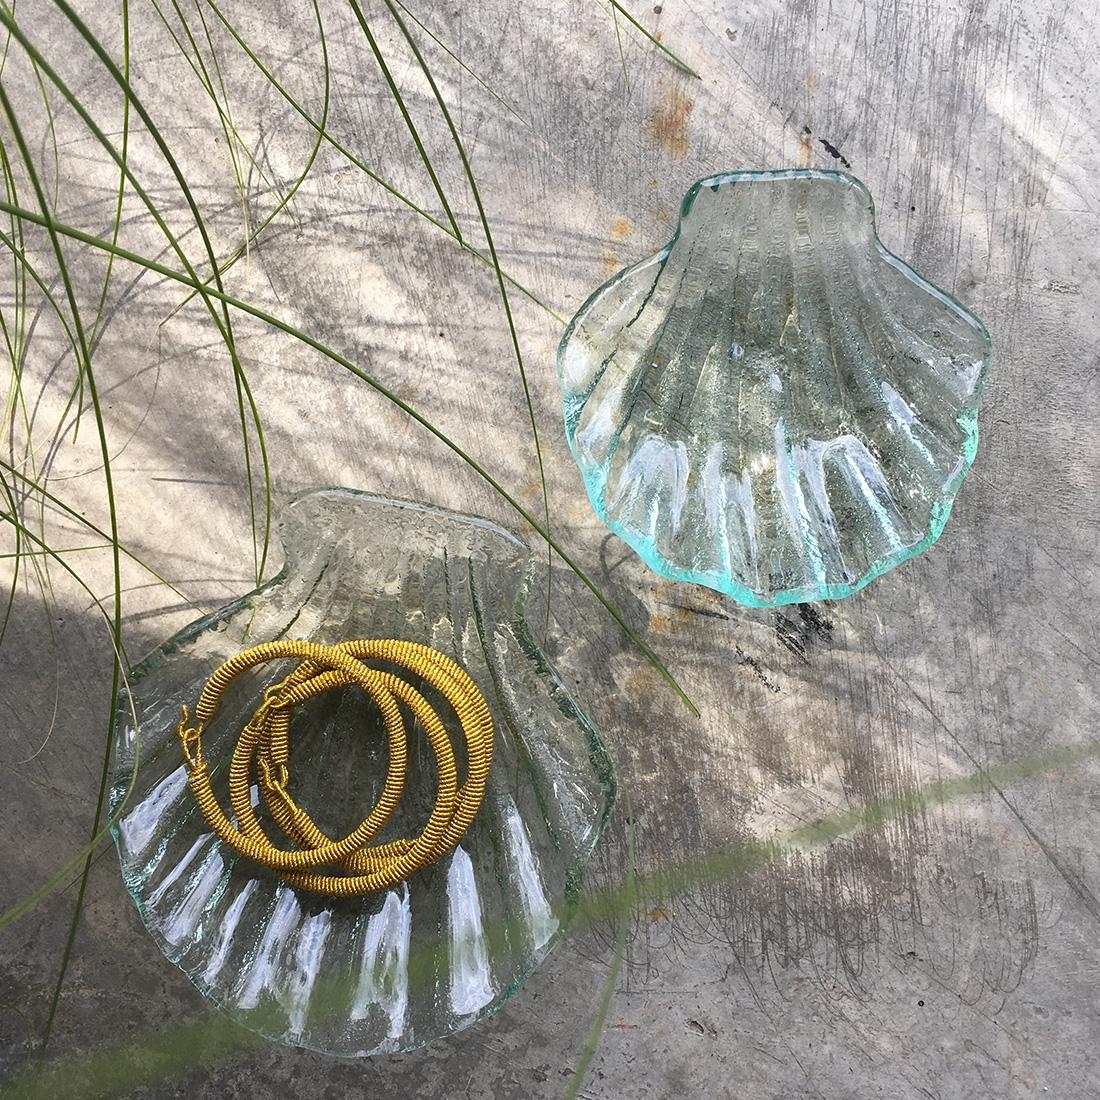 Coupelles coquillages en verre